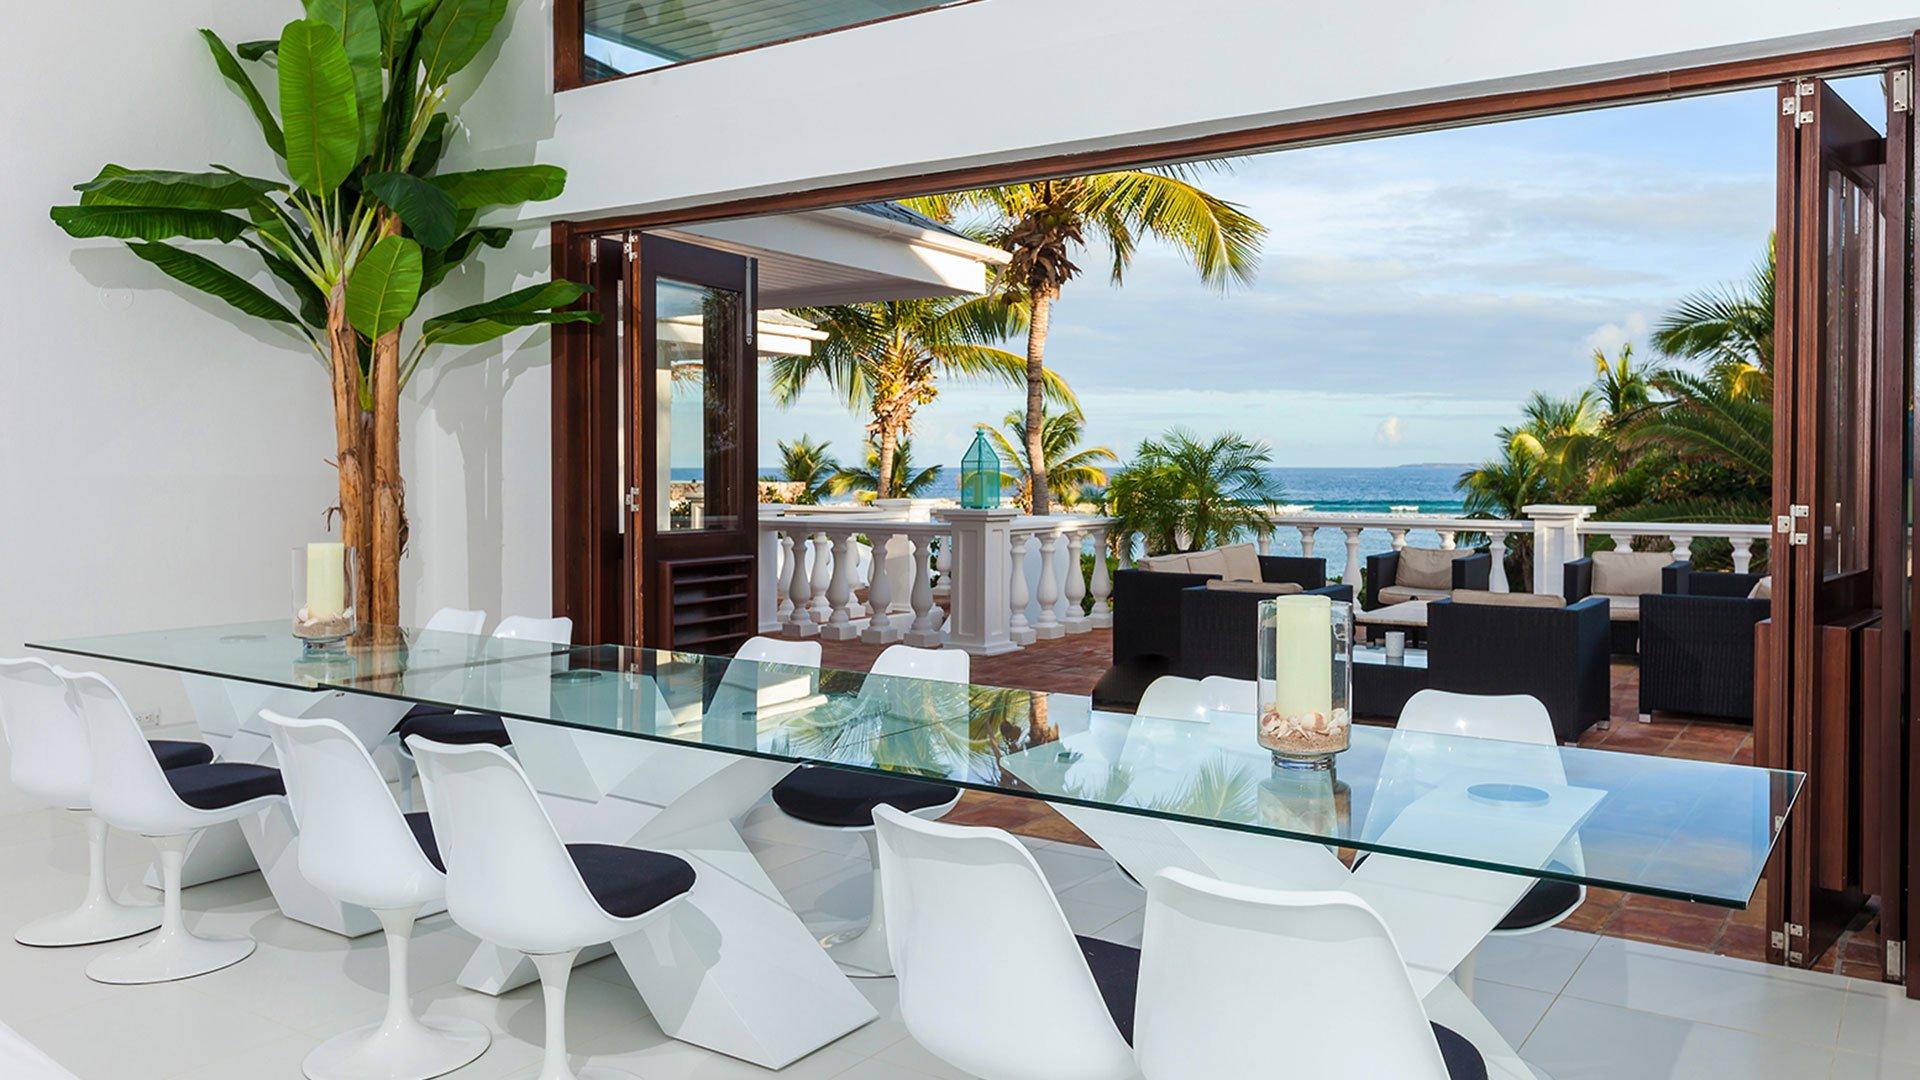 Indigo Villa Anguilla Rental Properties in Paradise dining